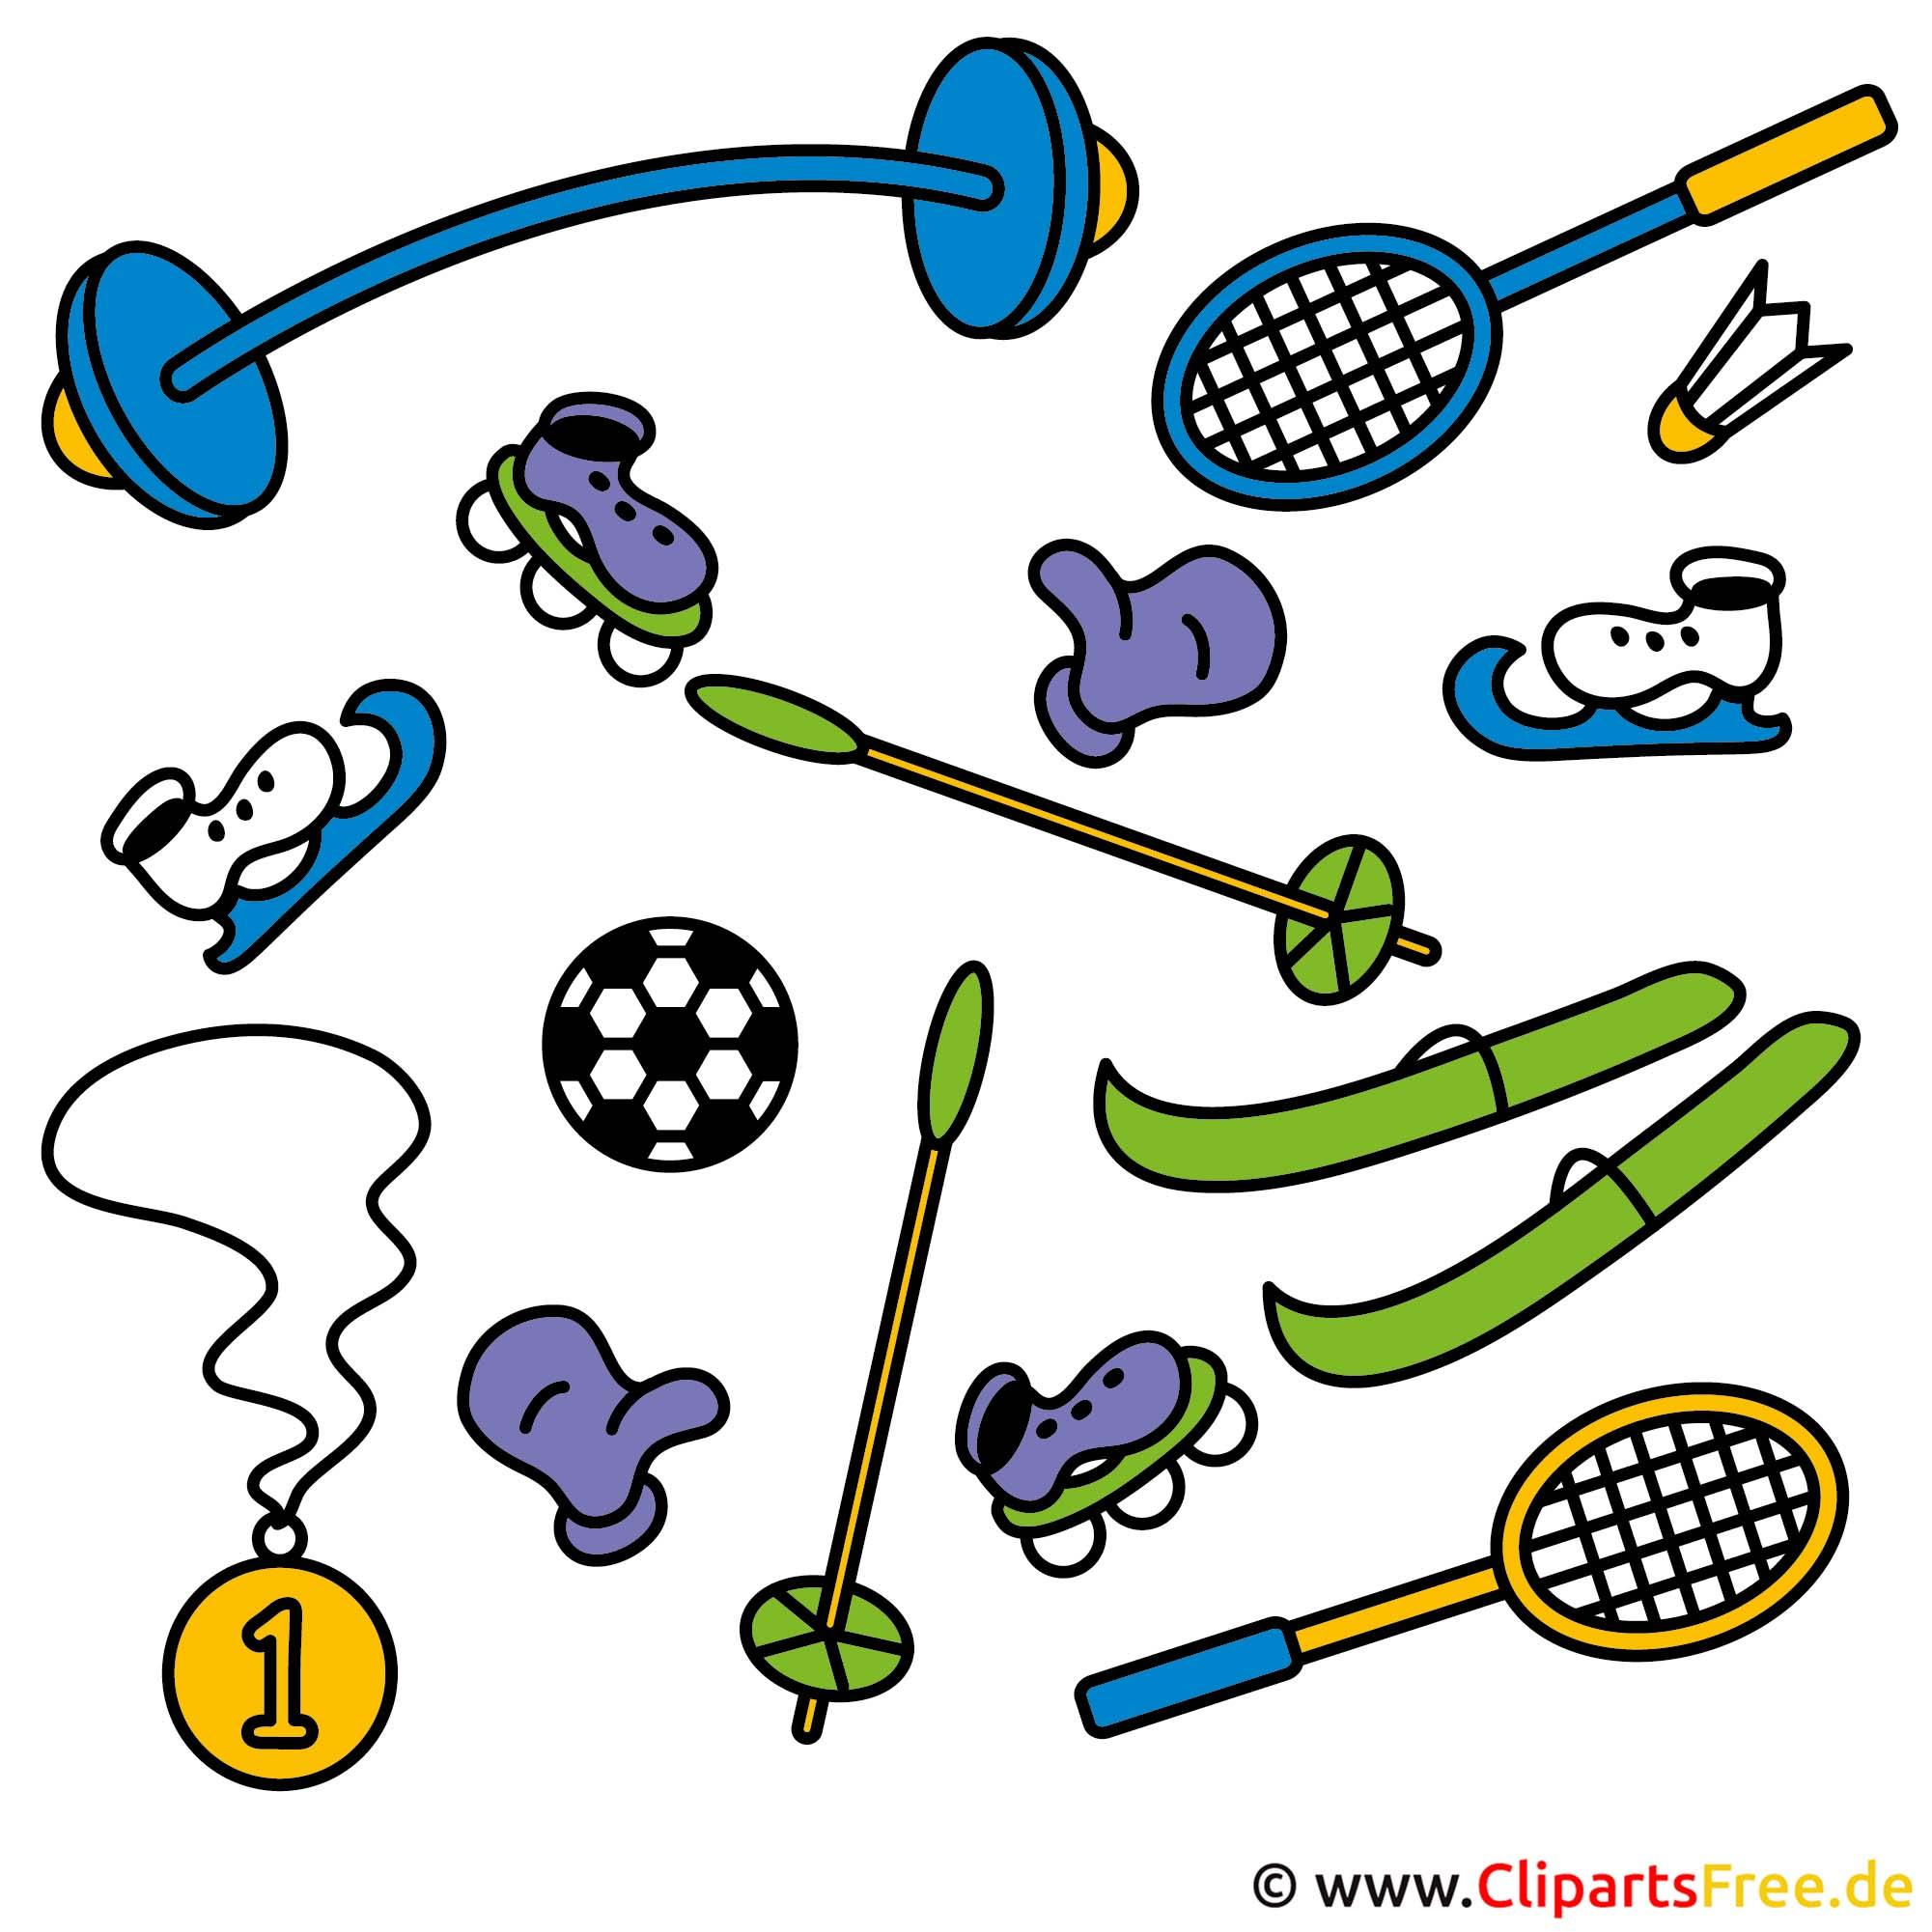 clipart sportive gratis - photo #20